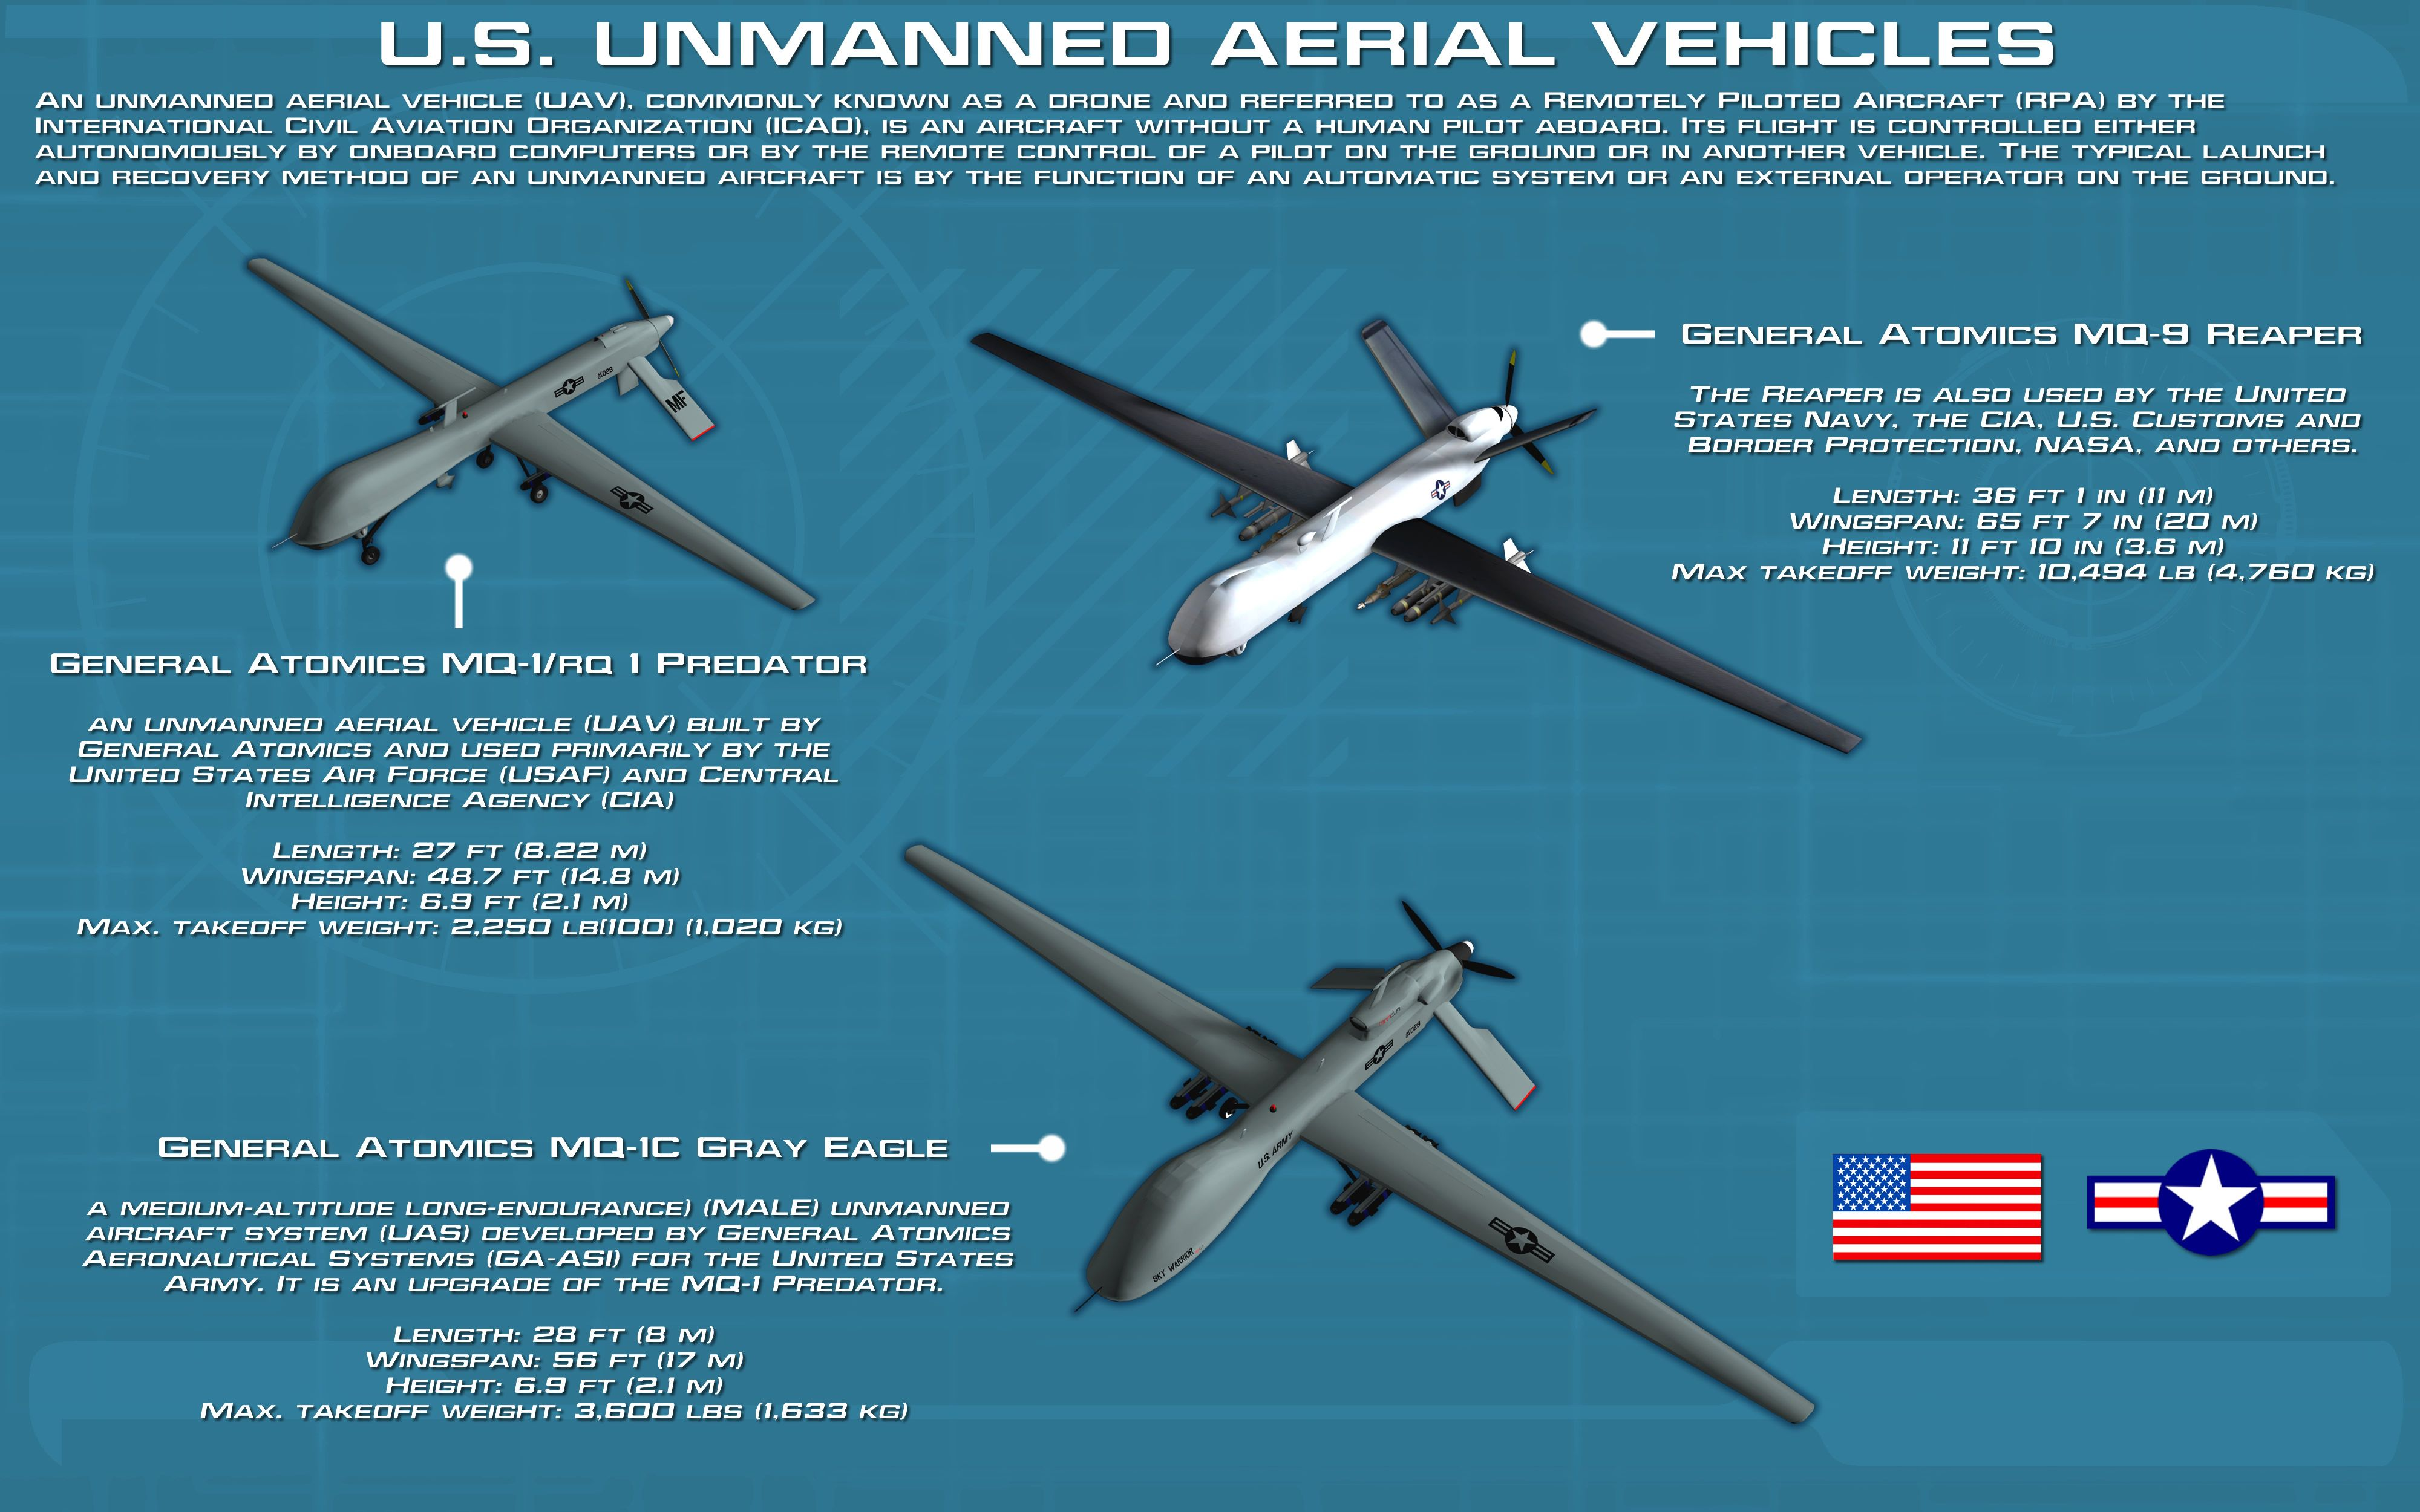 Unmanned Aerial Vehicles Tech Readout New By Unusualsuspex Deviantart Com On Deviantart Unmanned Aerial Vehicle Aerial Vehicles